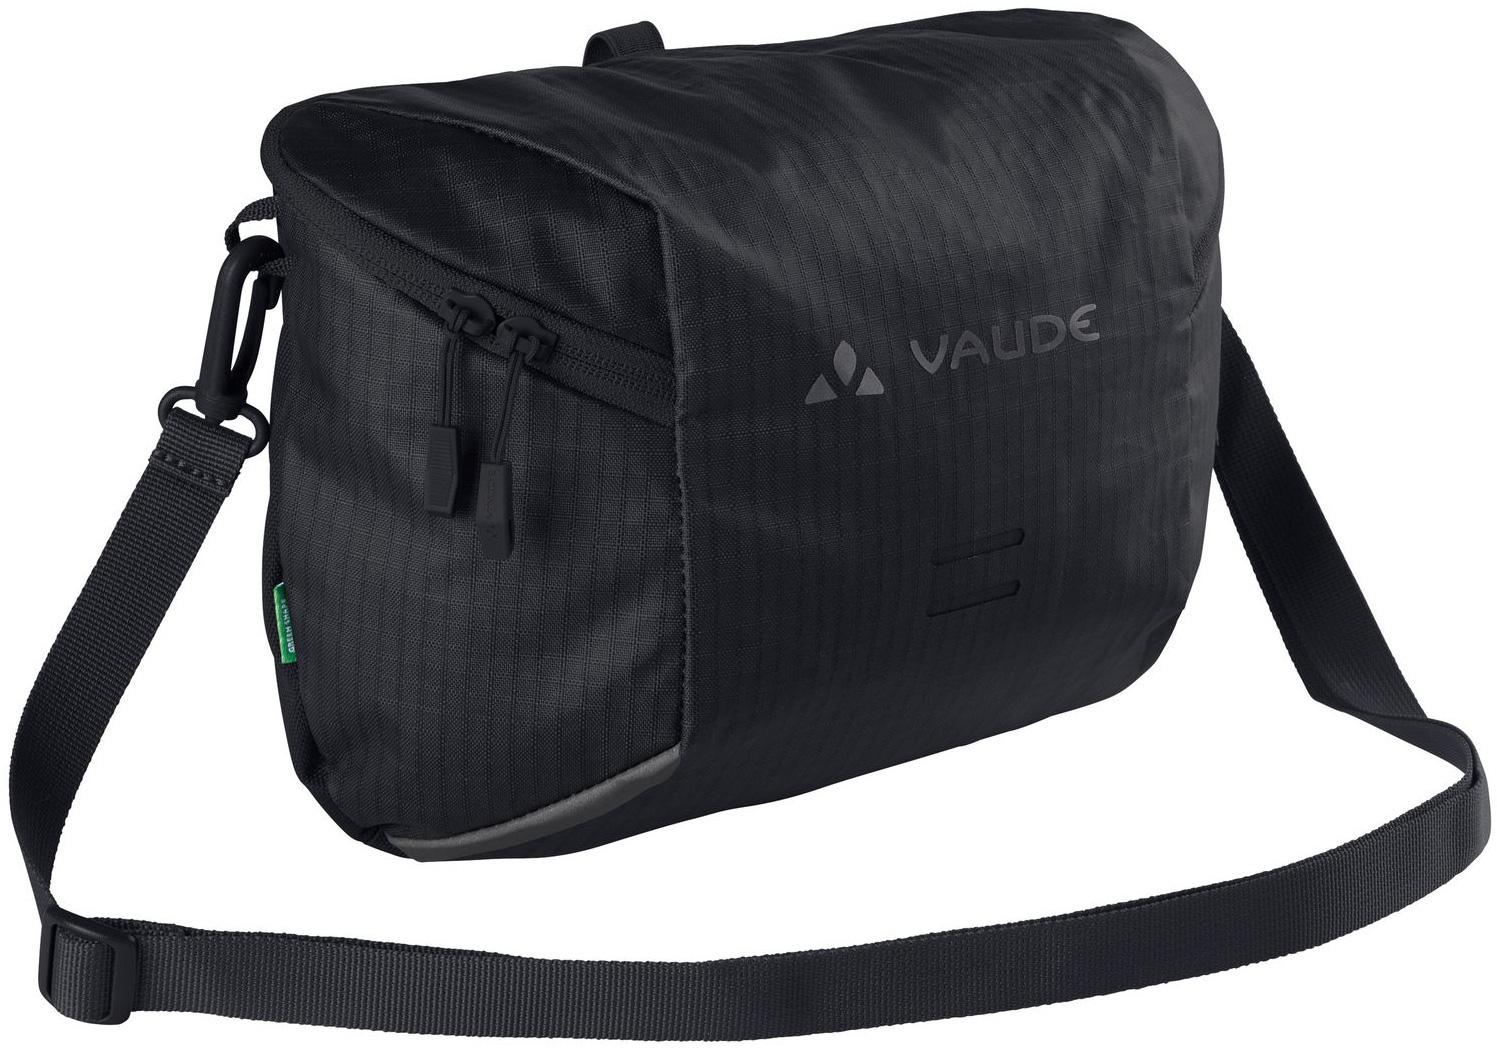 Image of Vaude CityBox Bike Handlebar Bag - black